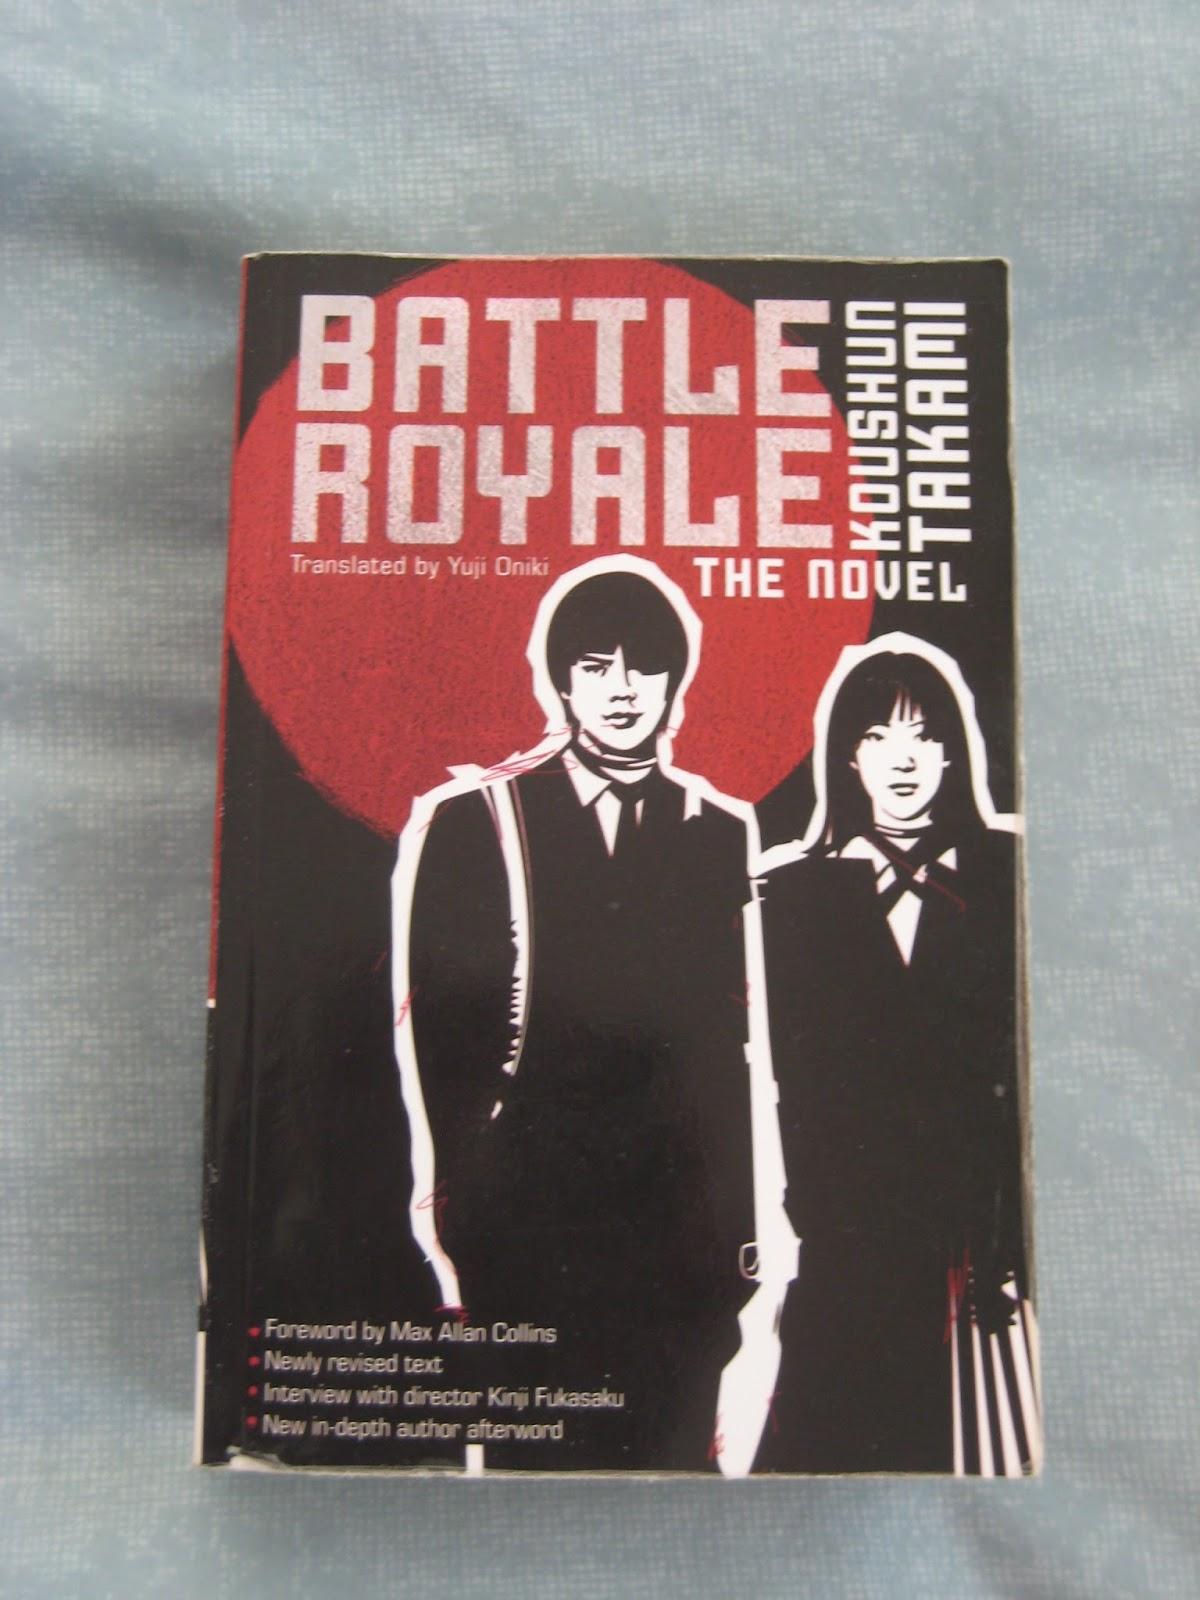 Two Hectobooks: R30  Battle Royale by Koushun Takami